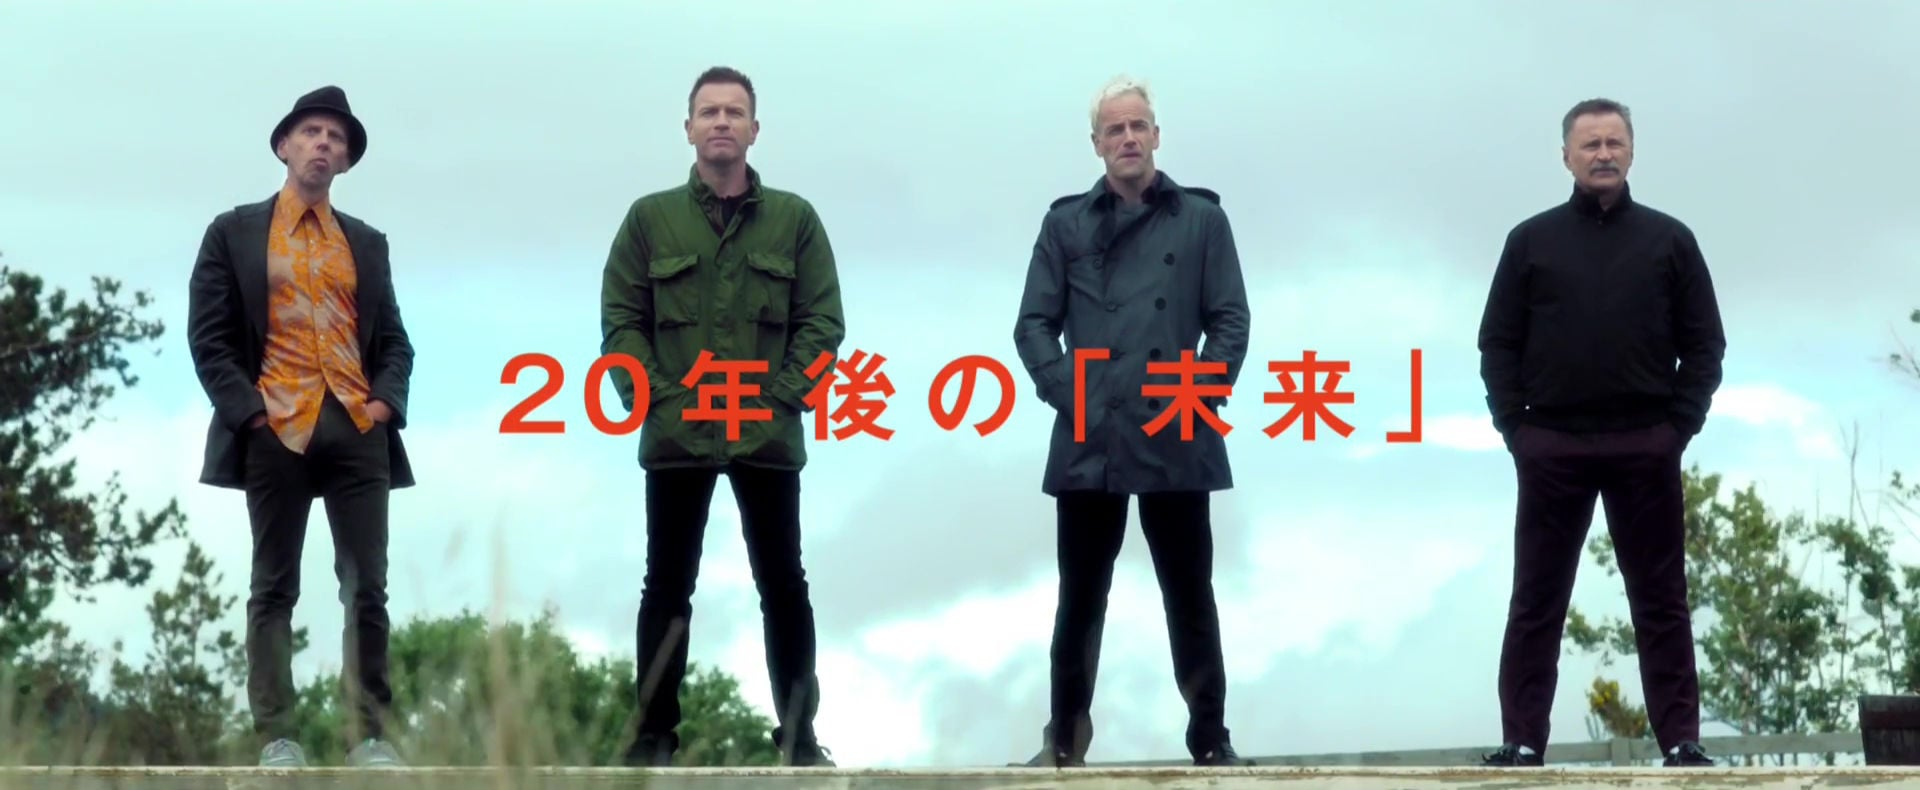 Trainspotting2 jp